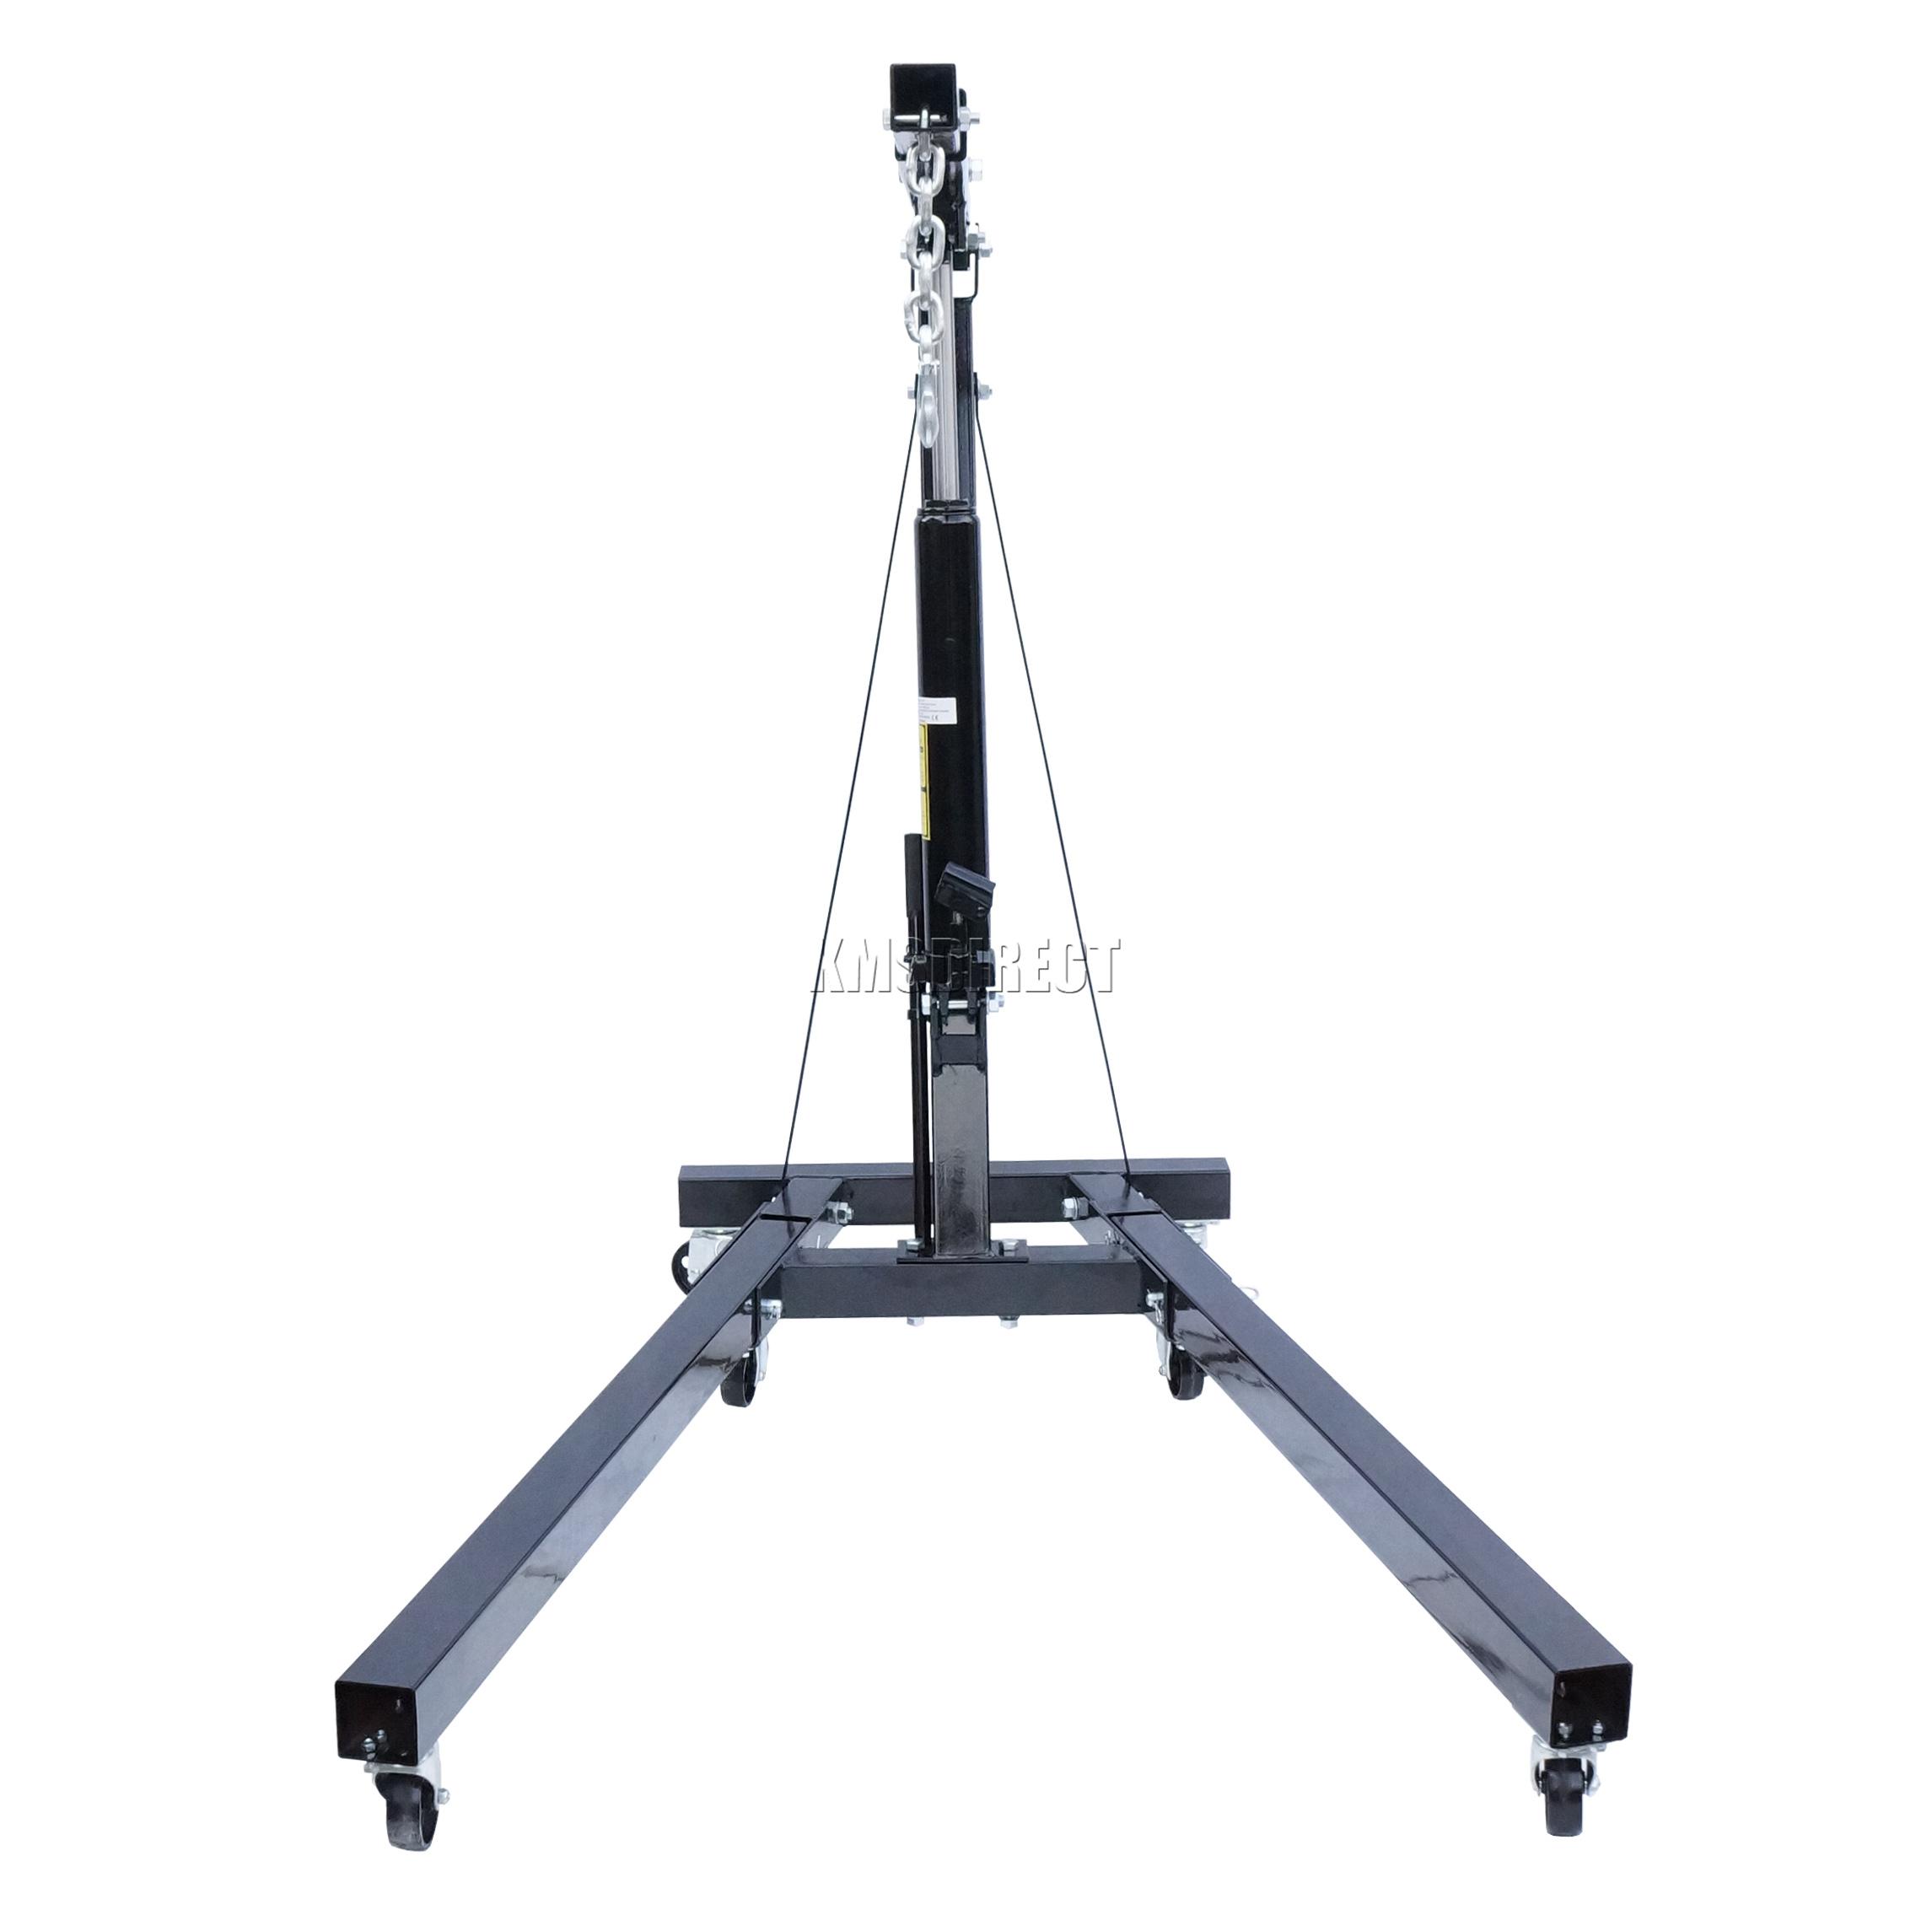 Folding Jack Stands >> FoxHunter 2 Ton Tonne Hydraulic Folding Engine Crane Stand Hoist lift Jack Black | eBay